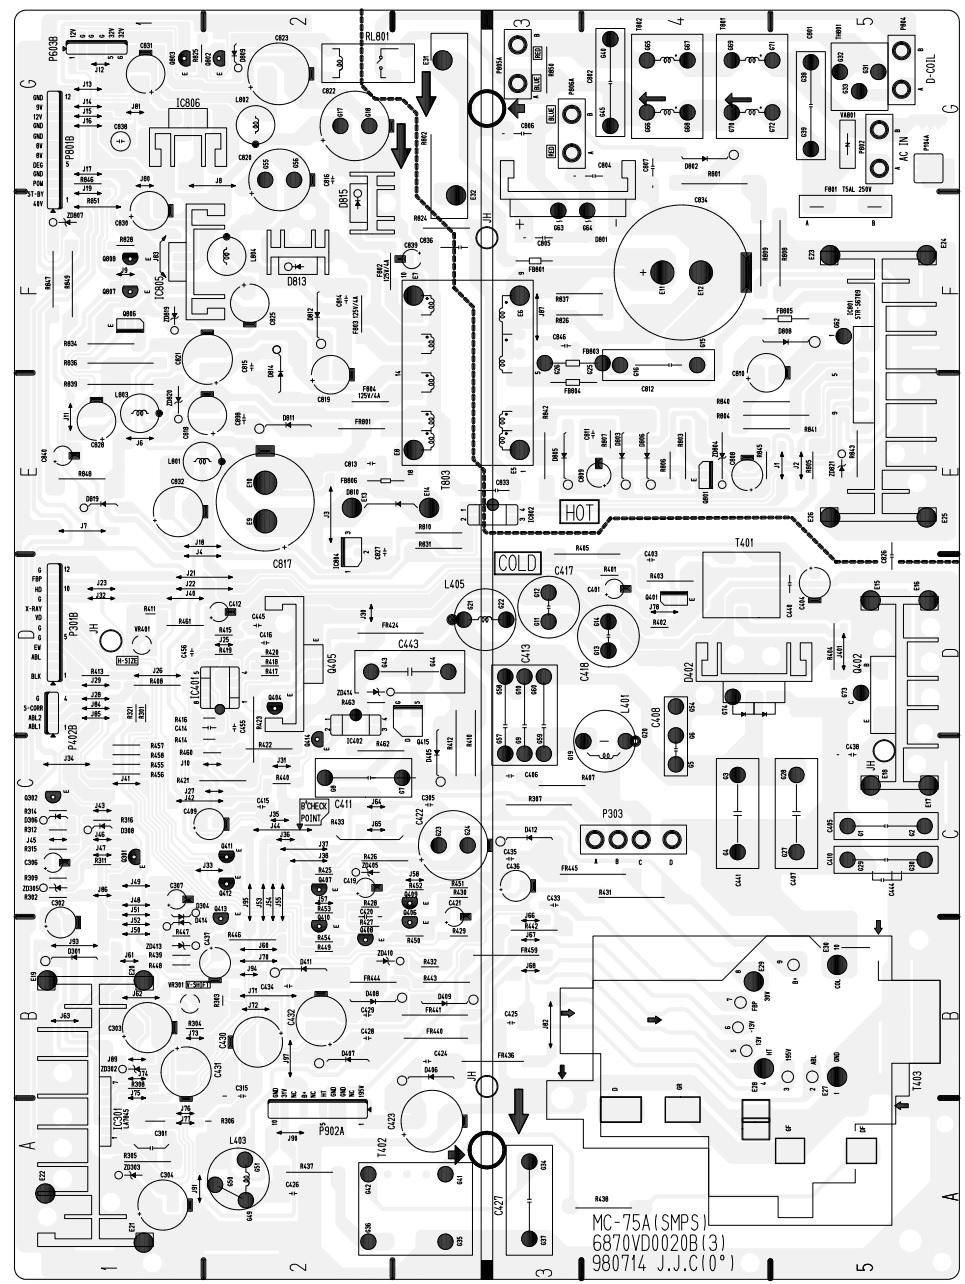 Lg Crt Tv Circuit Diagram Pdf – Periodic & Diagrams Science